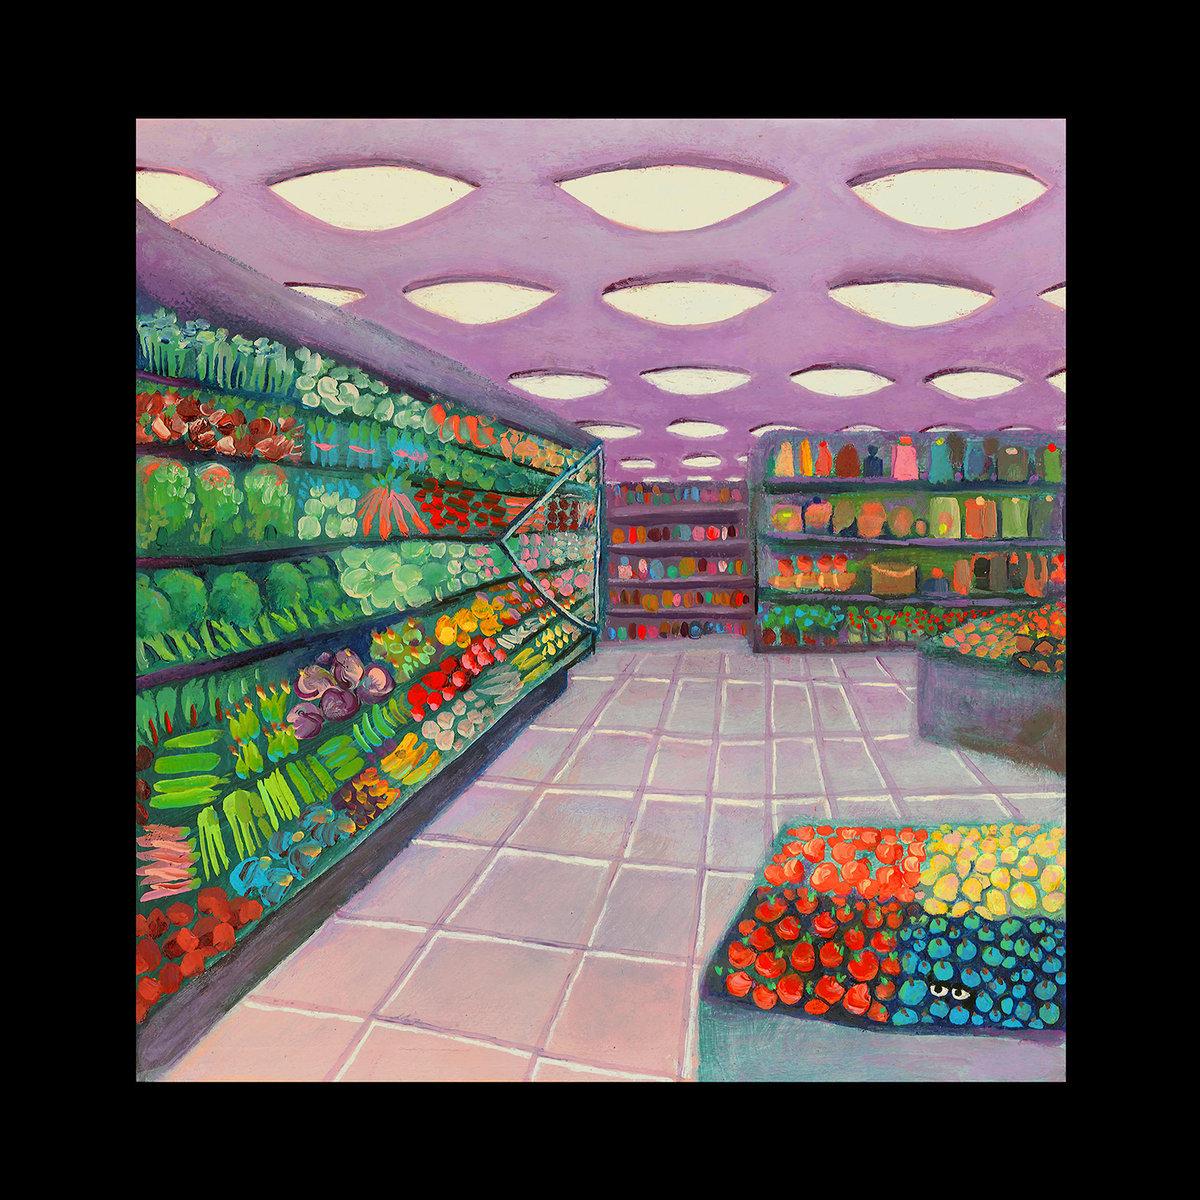 Palehound / A Place I'll Always Go(LP)